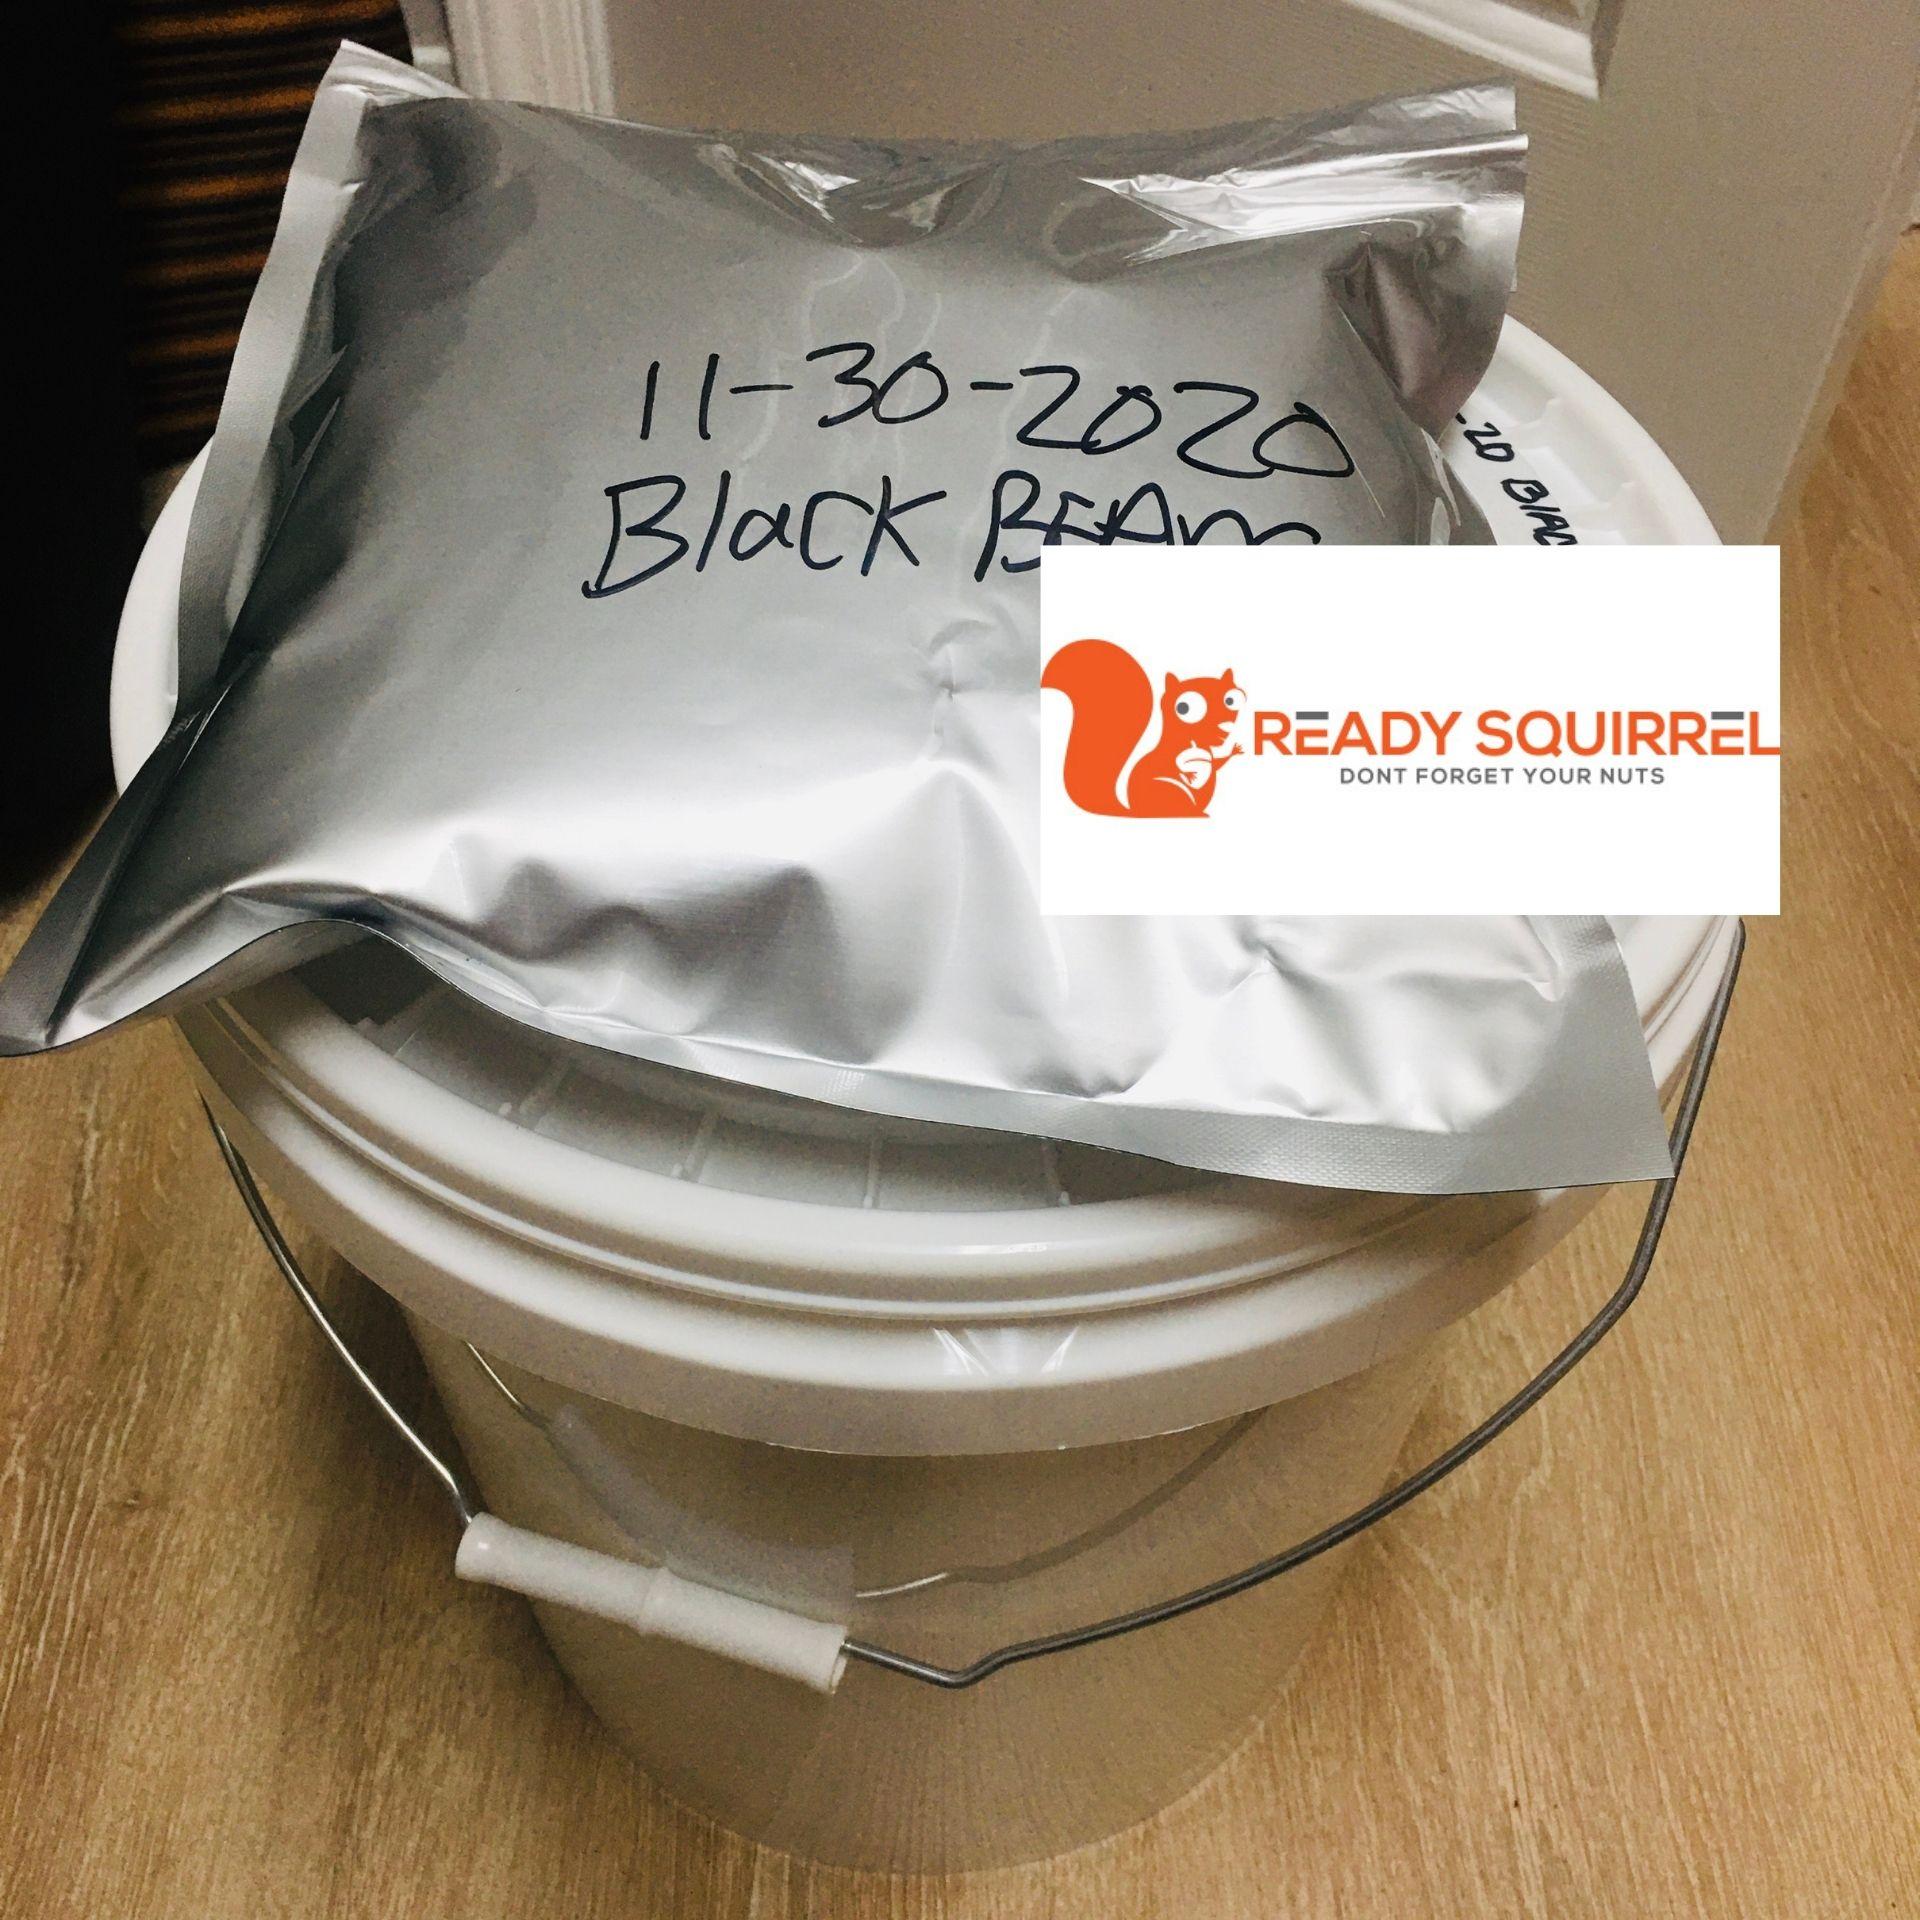 Mylar Bag: Best DIY Food Storage Container